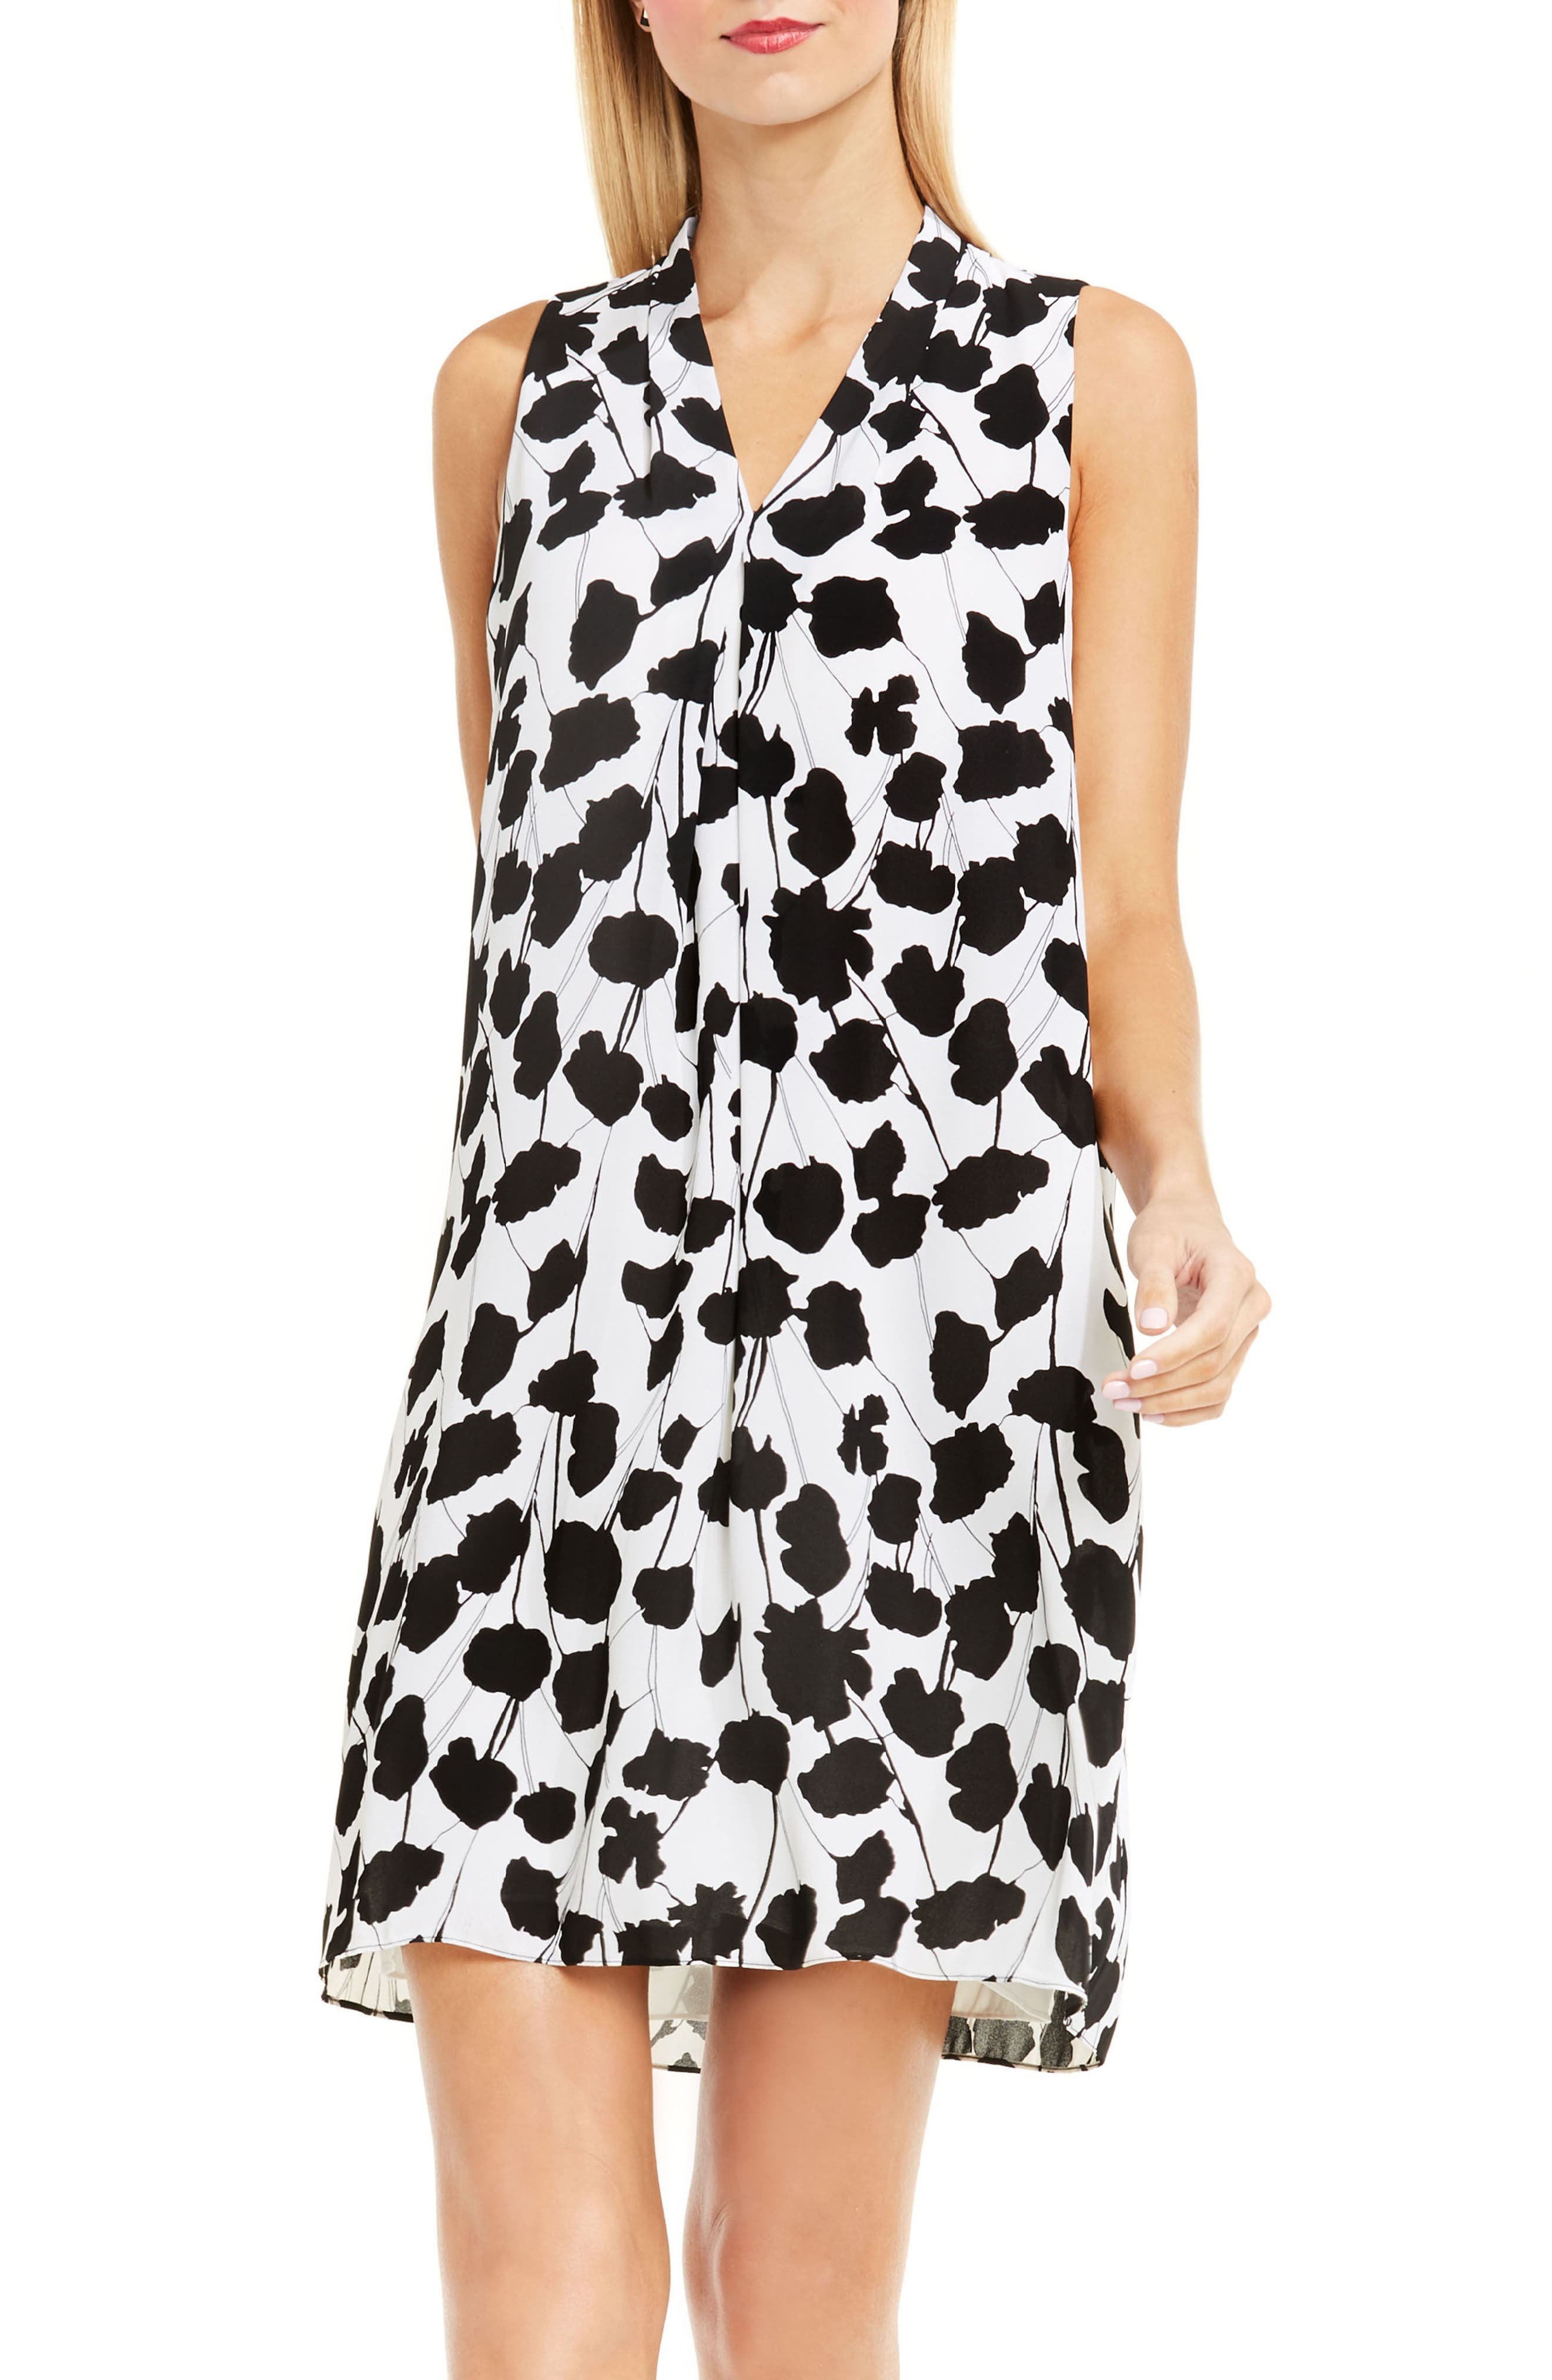 Alternate Image 1 Selected - Vince Camuto Elegant Blossom Shift Dress (Regular & Petite)